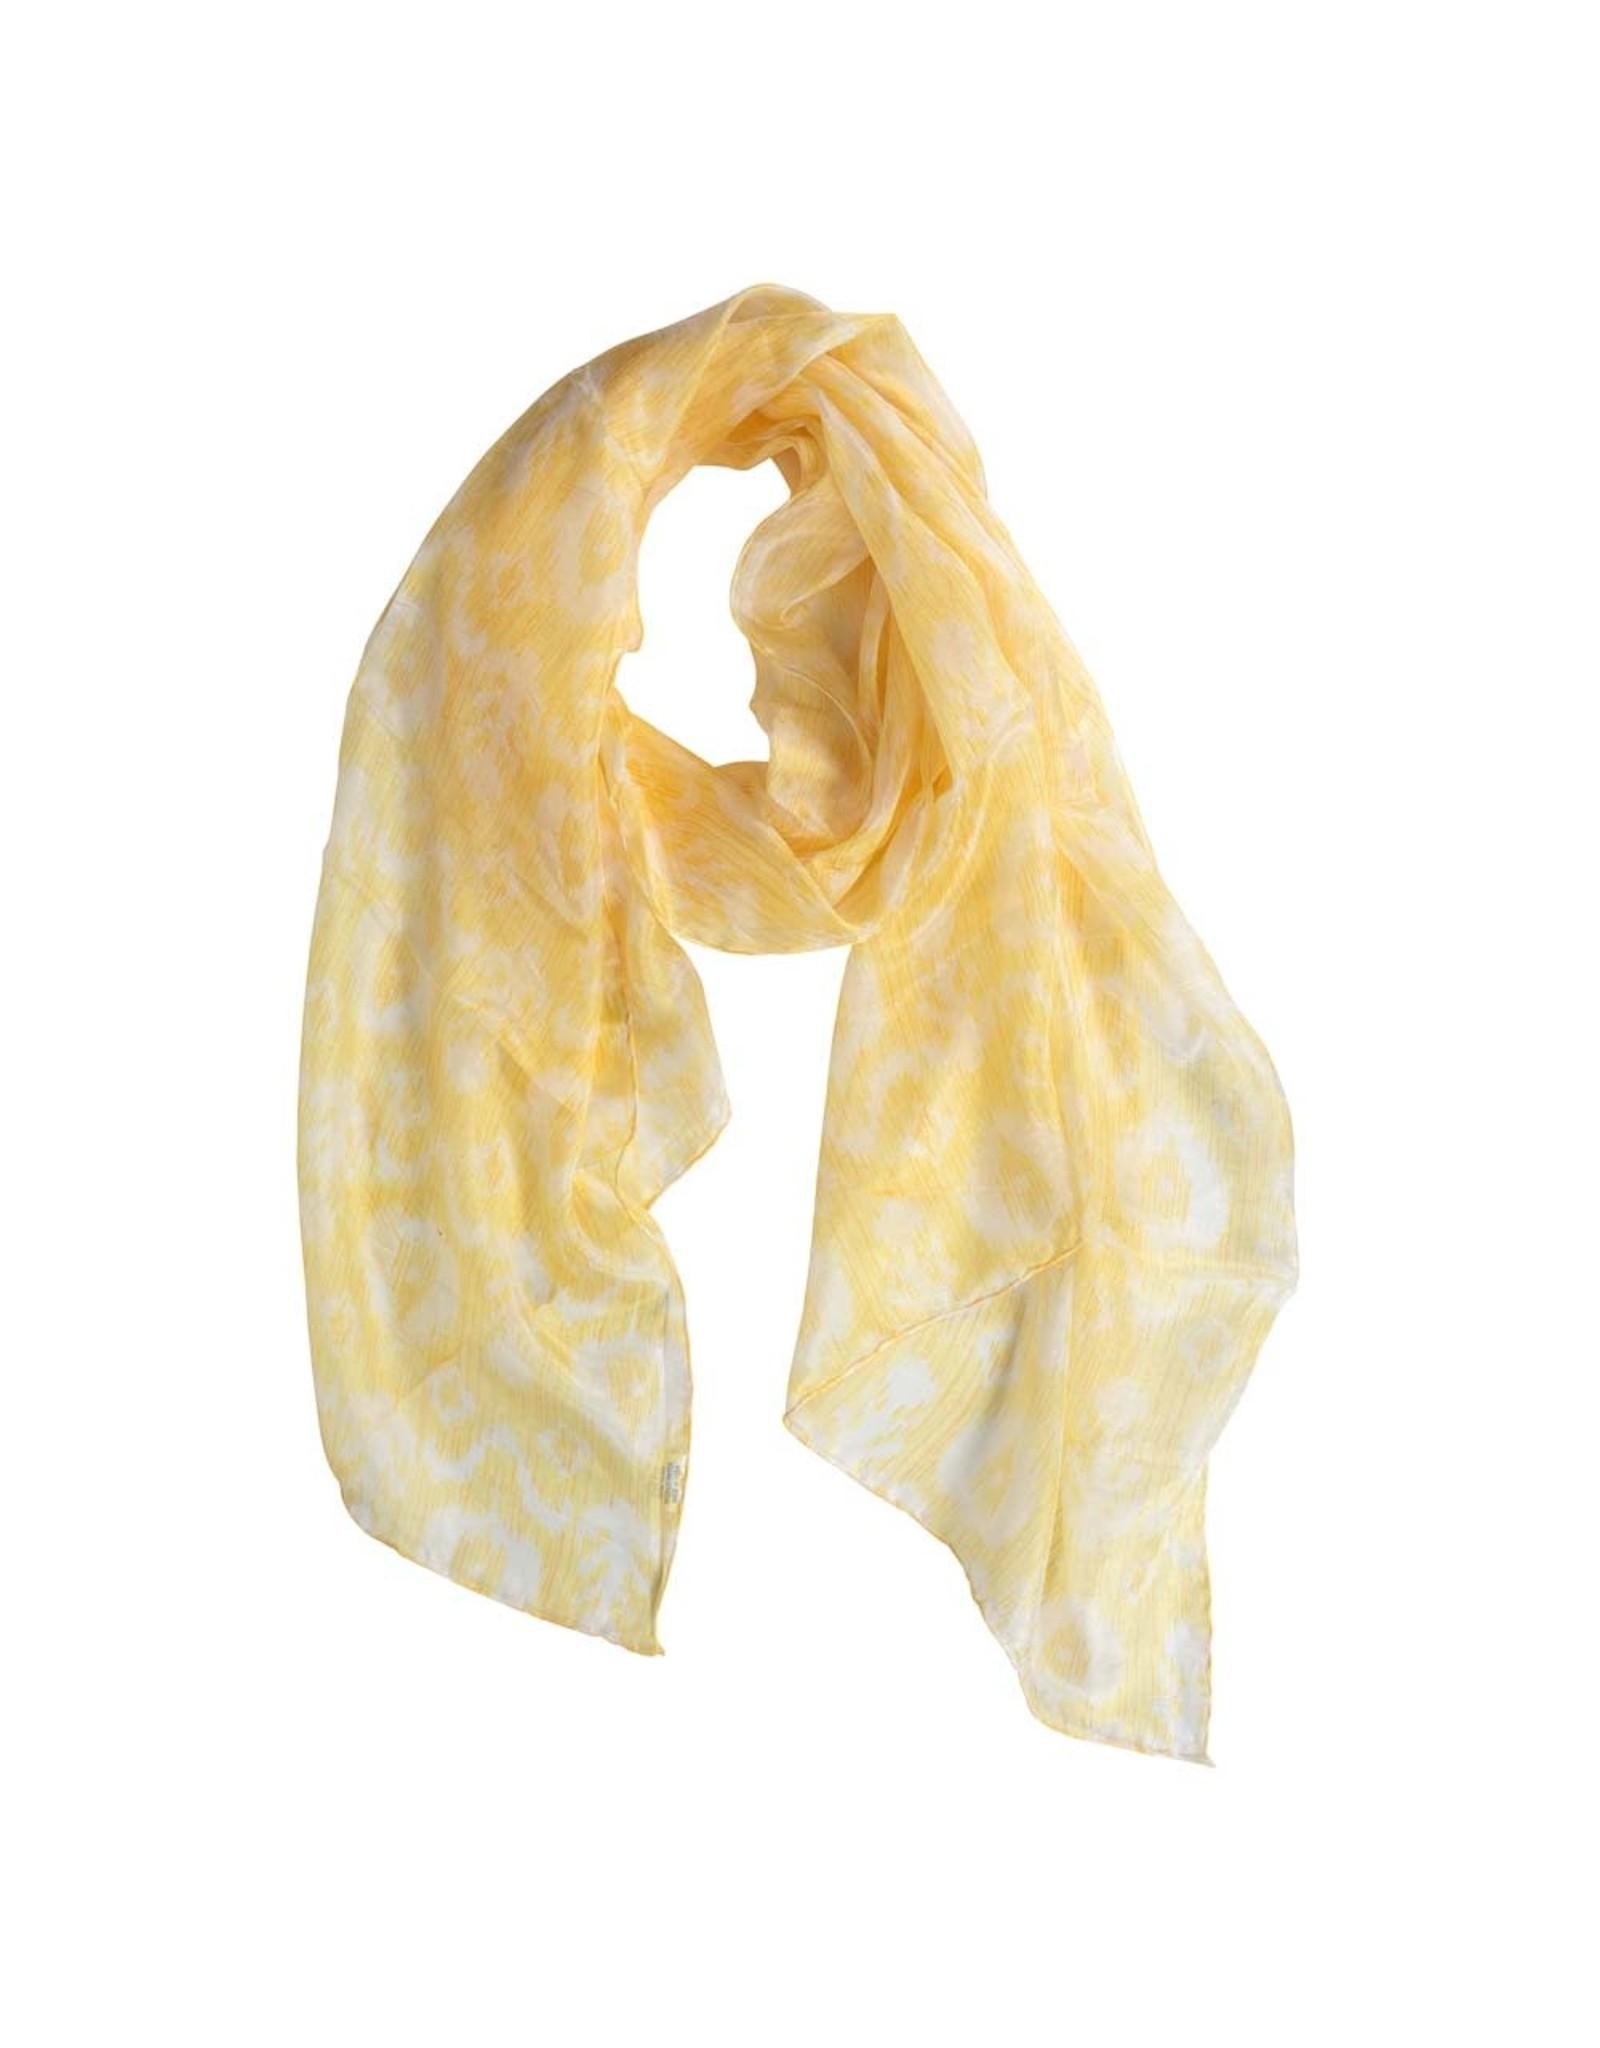 TTV USA Buttercup Silk Ikat Scarf, India.